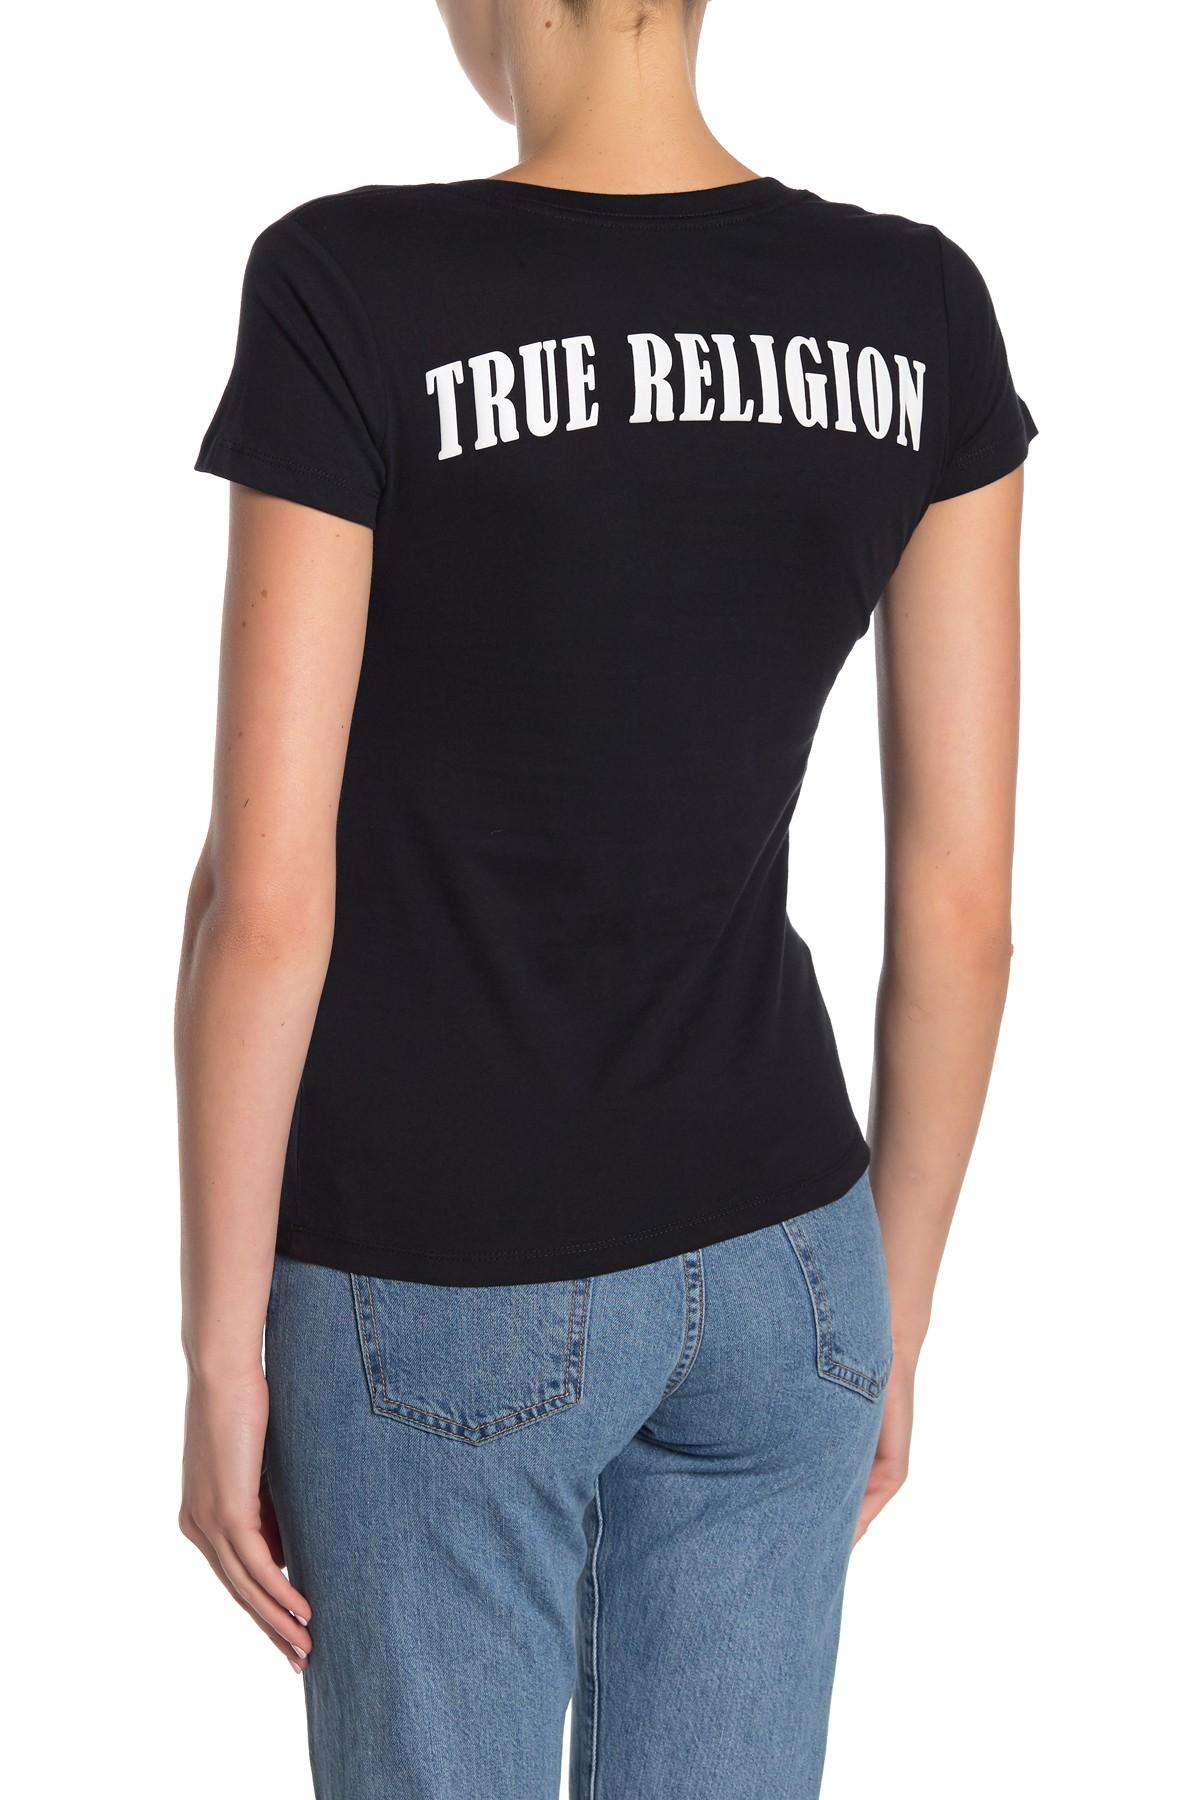 True-Religion-Women-039-s-Double-Puff-V-Neck-Tee-T-Shirt thumbnail 3